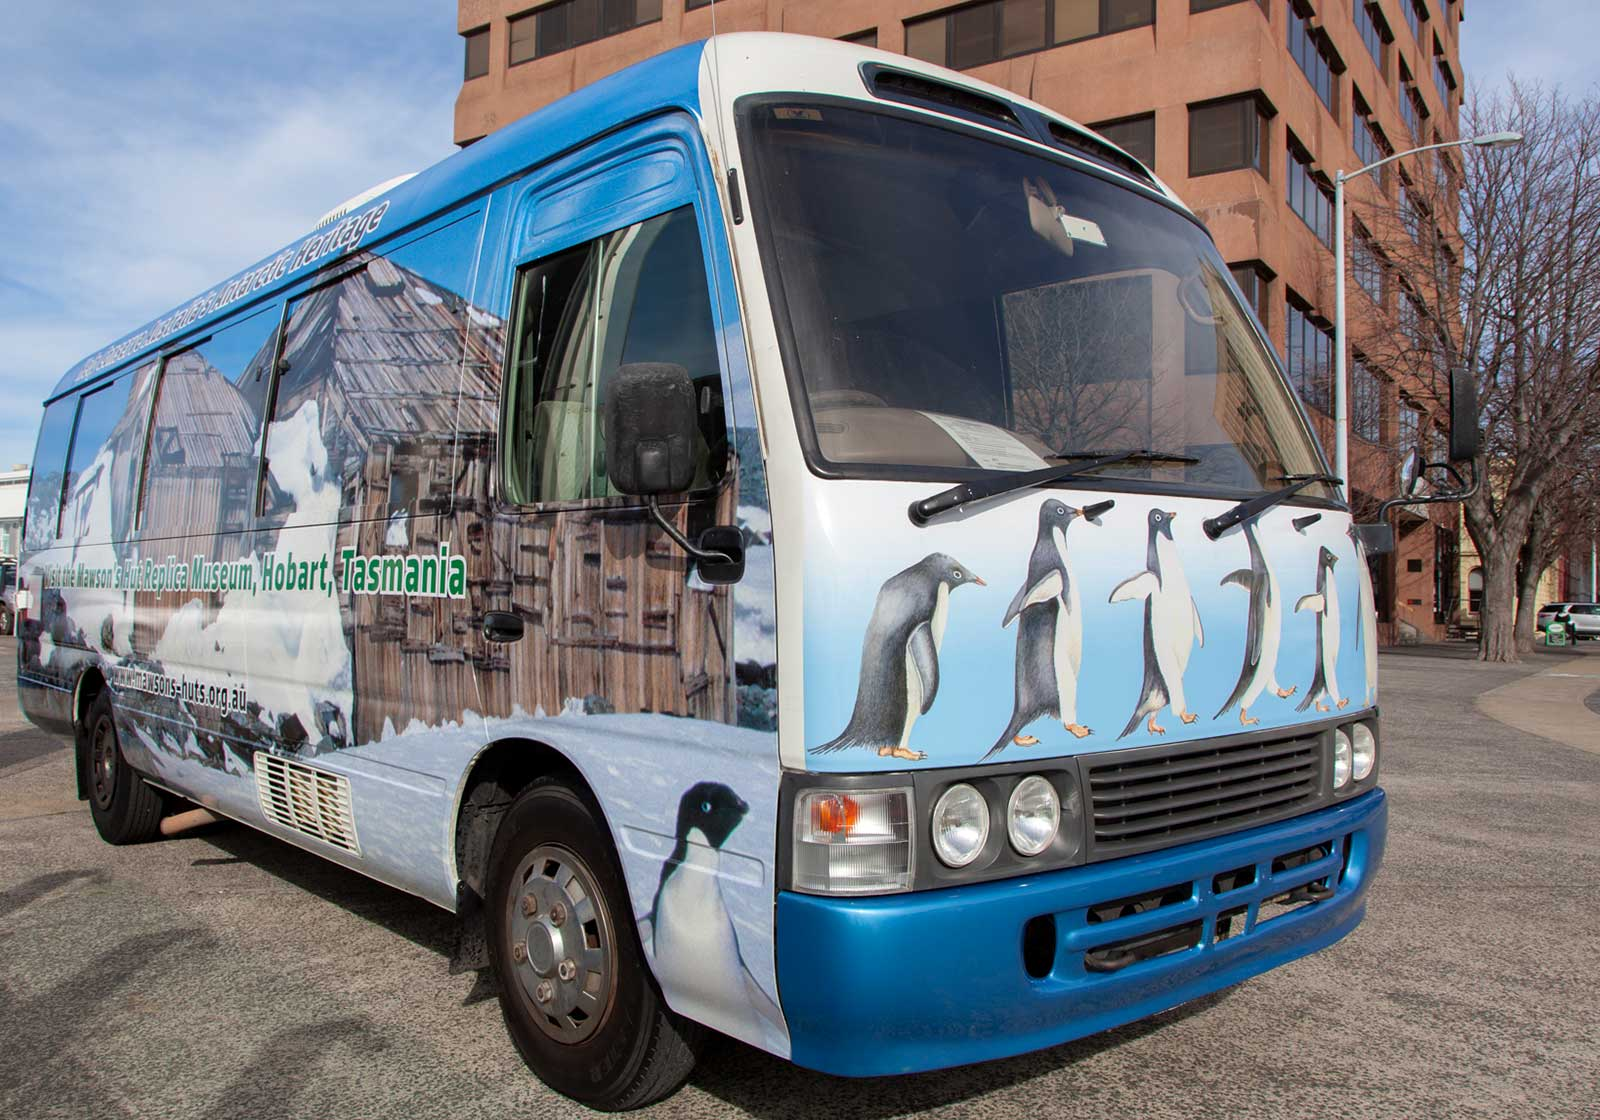 Mawson, Mawson's Huts, Mawson's Huts Foundation, Australia's Antarctic Heritage, Antarctic History, Mobile Antarctic Classroom,Antarctic Environmental and Sustainability Bus